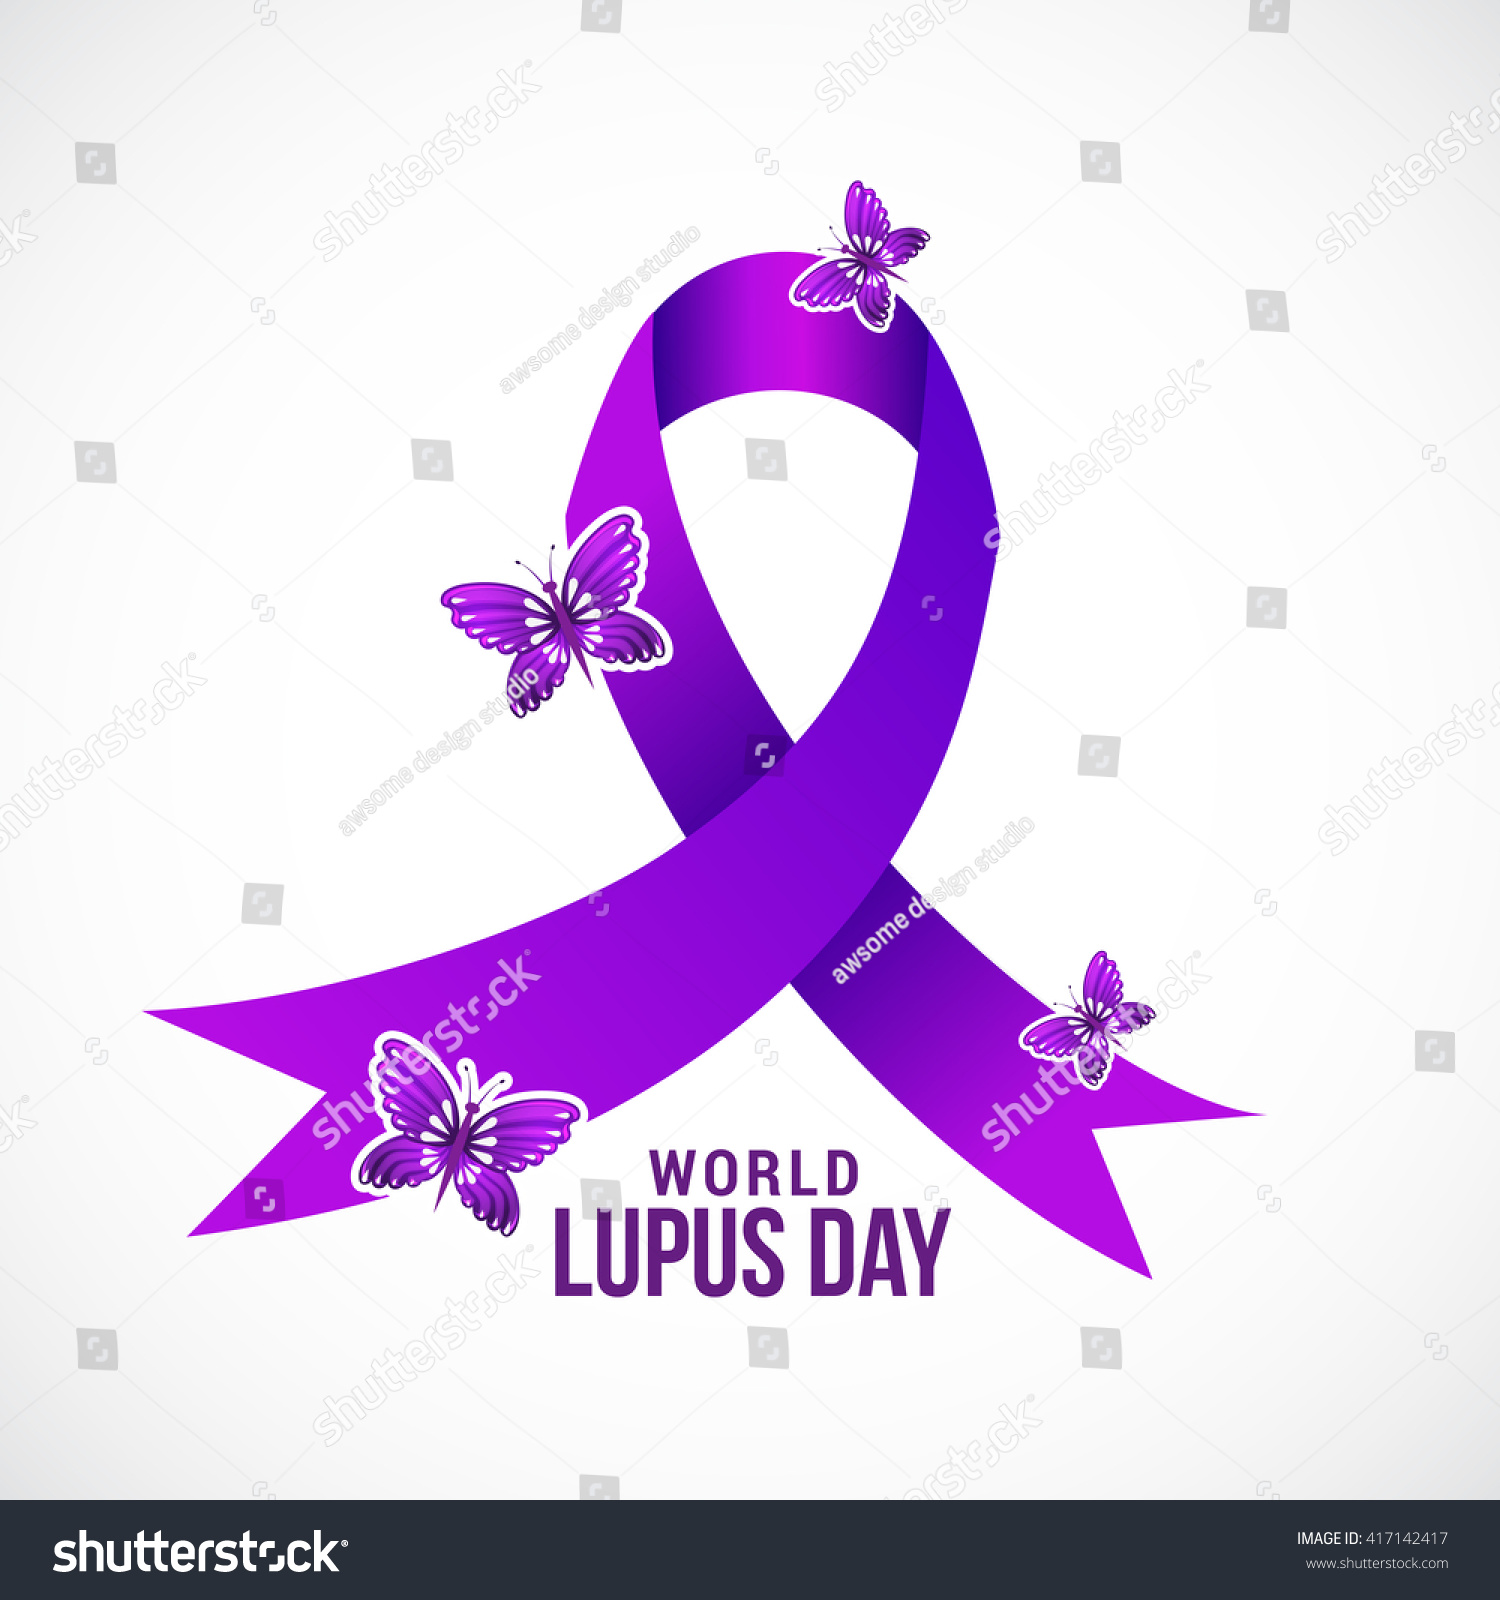 Vector Illustration World Lupus Day Stylish Stock Vector 417142417